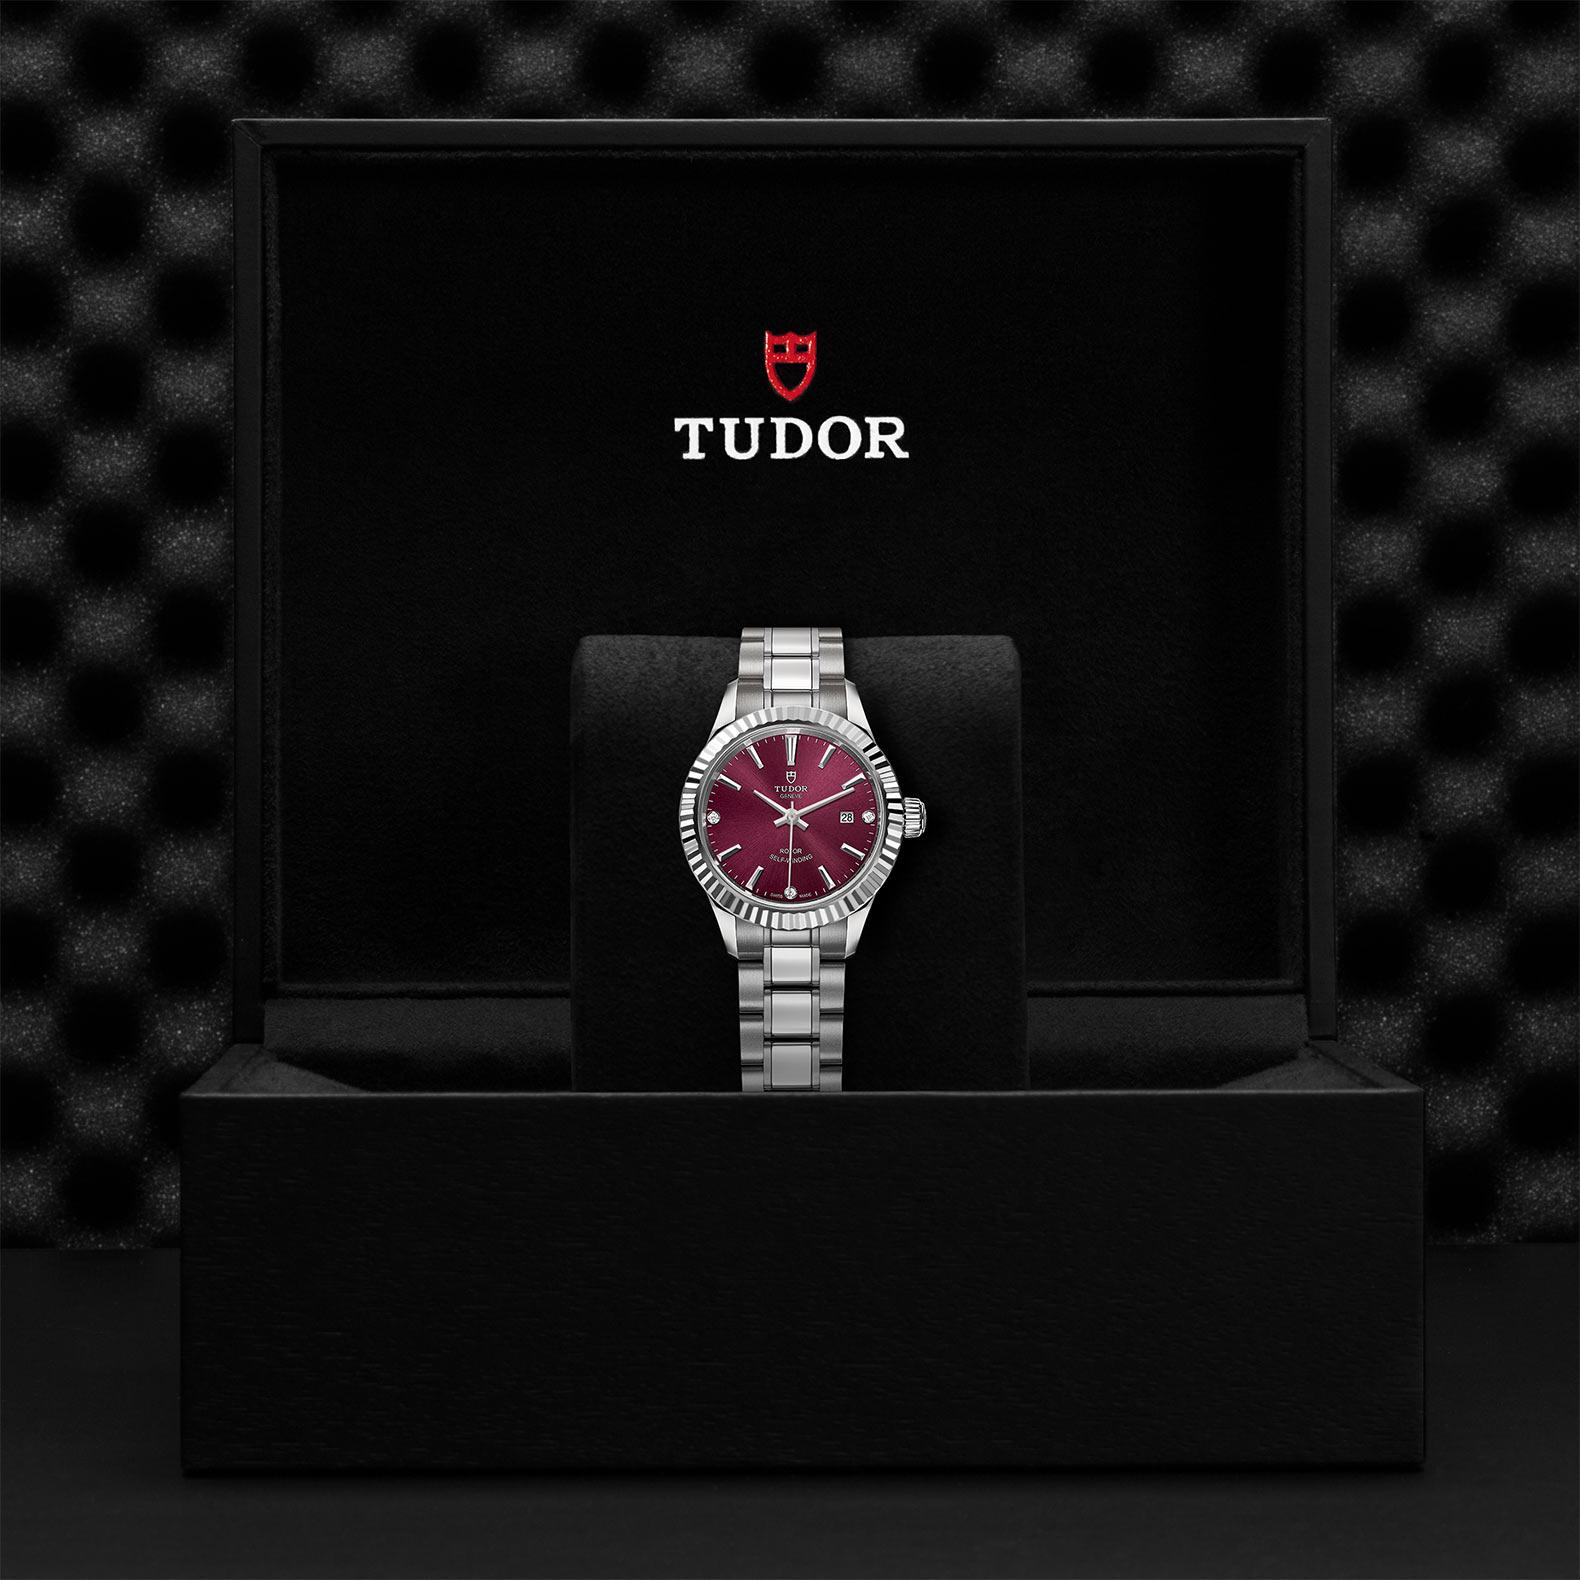 TUDOR Style M12110 0019 Presentation